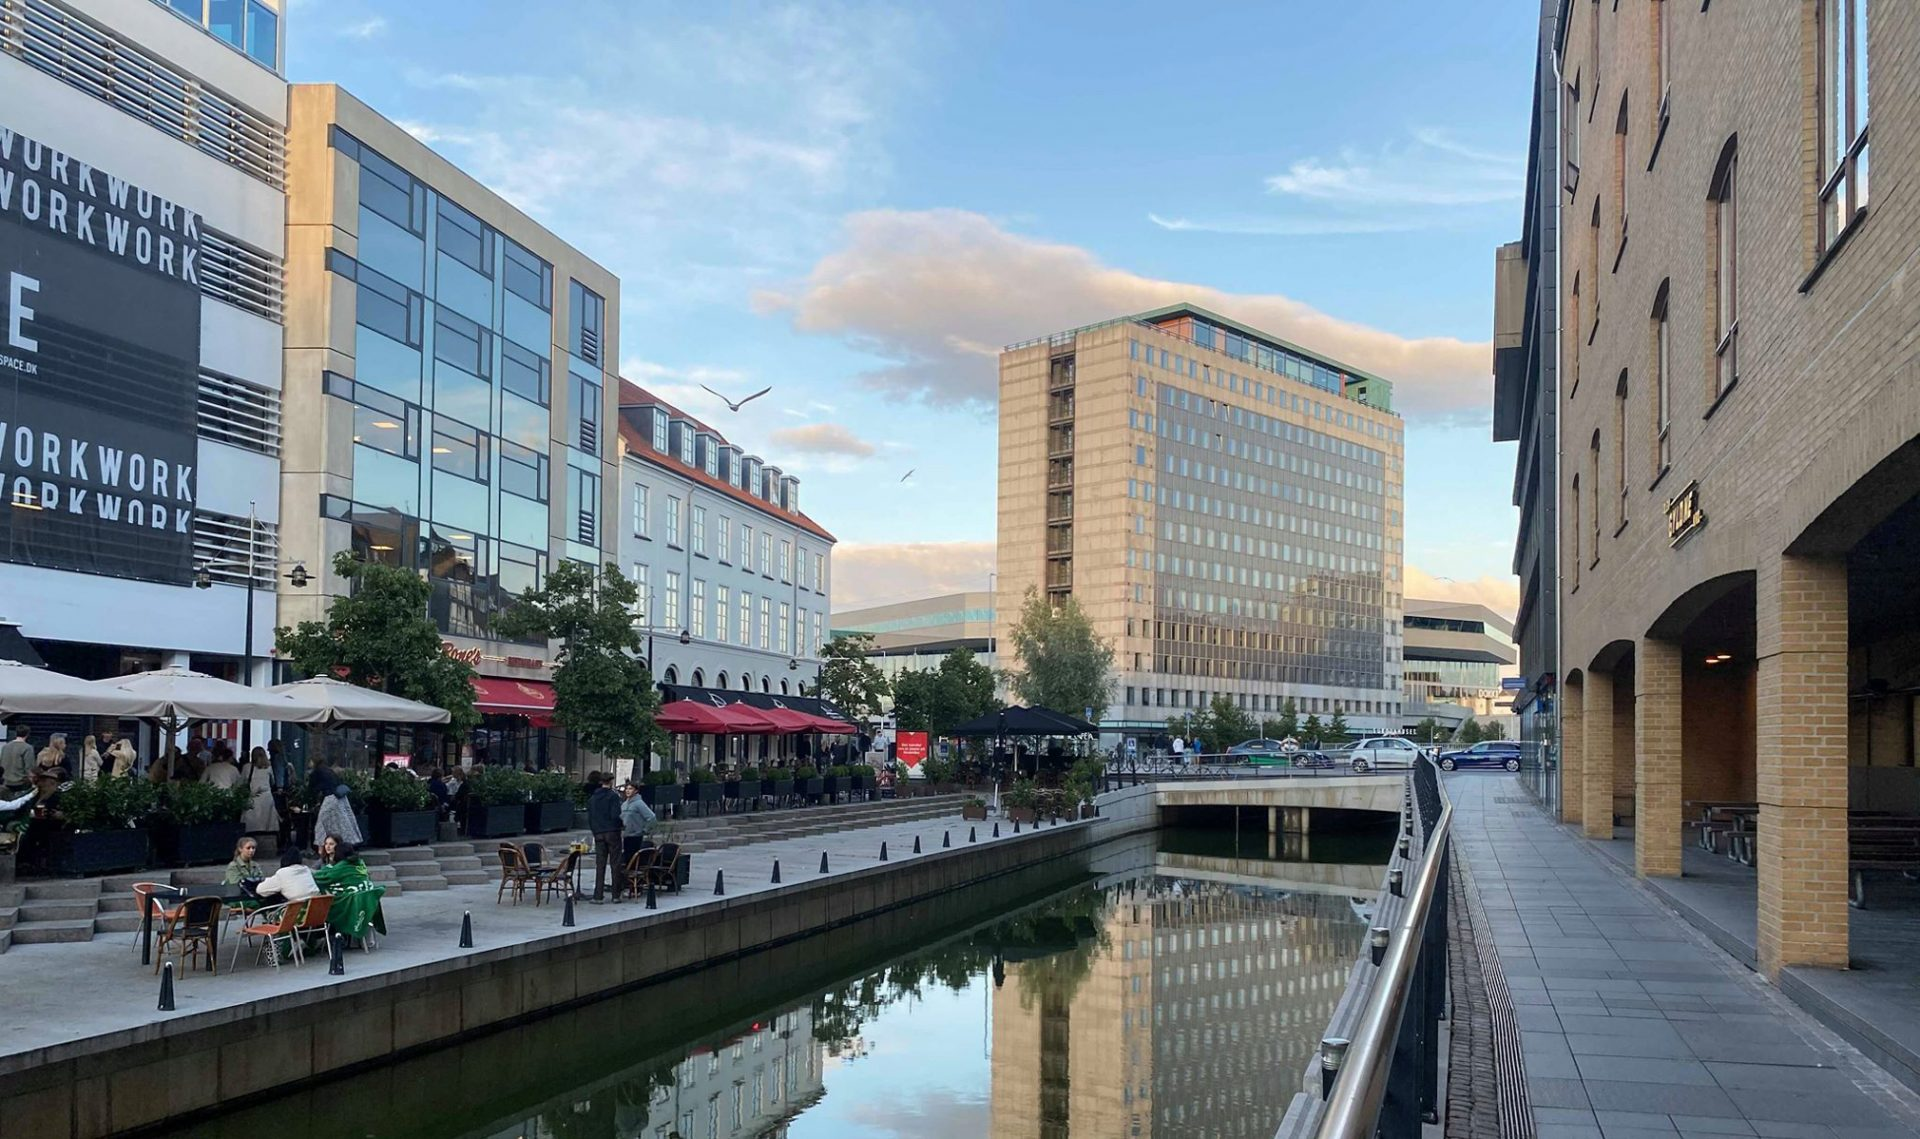 Pita Boulevard åbner ved åen: Inspirationen kommer fra Jacob's Pitabar